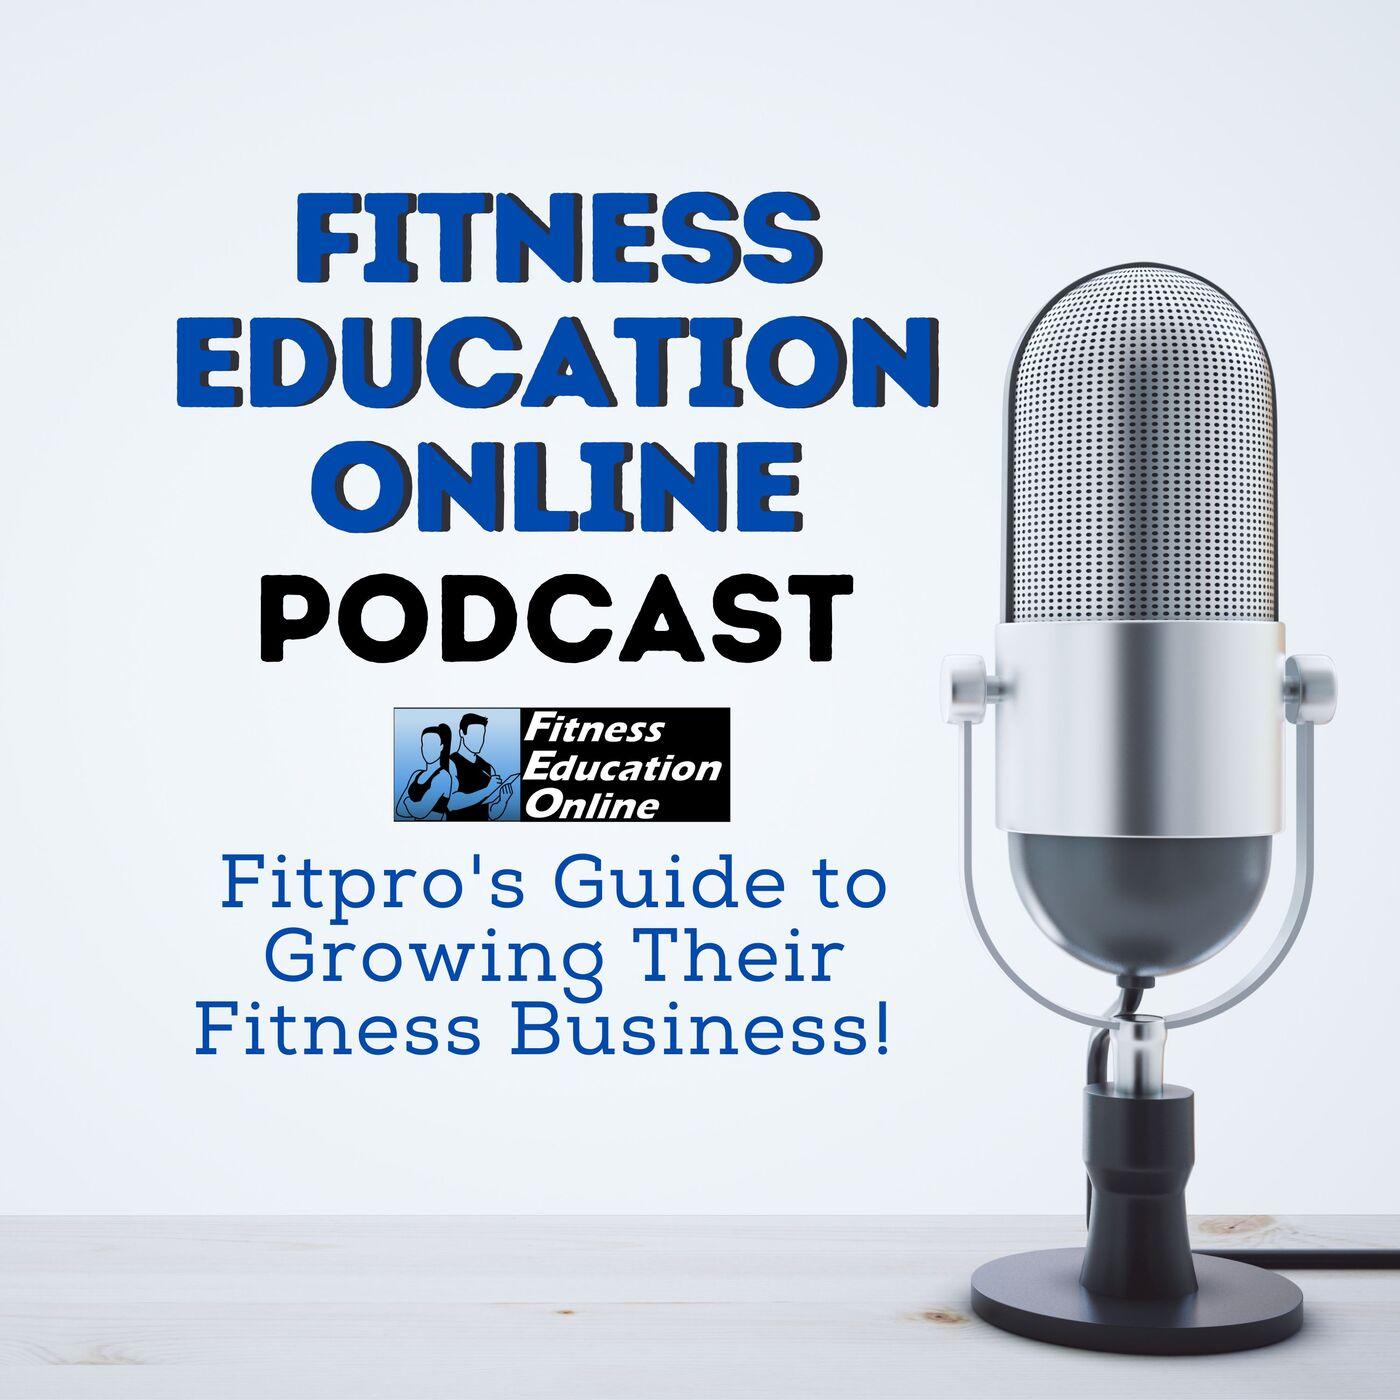 Fitness Education Online